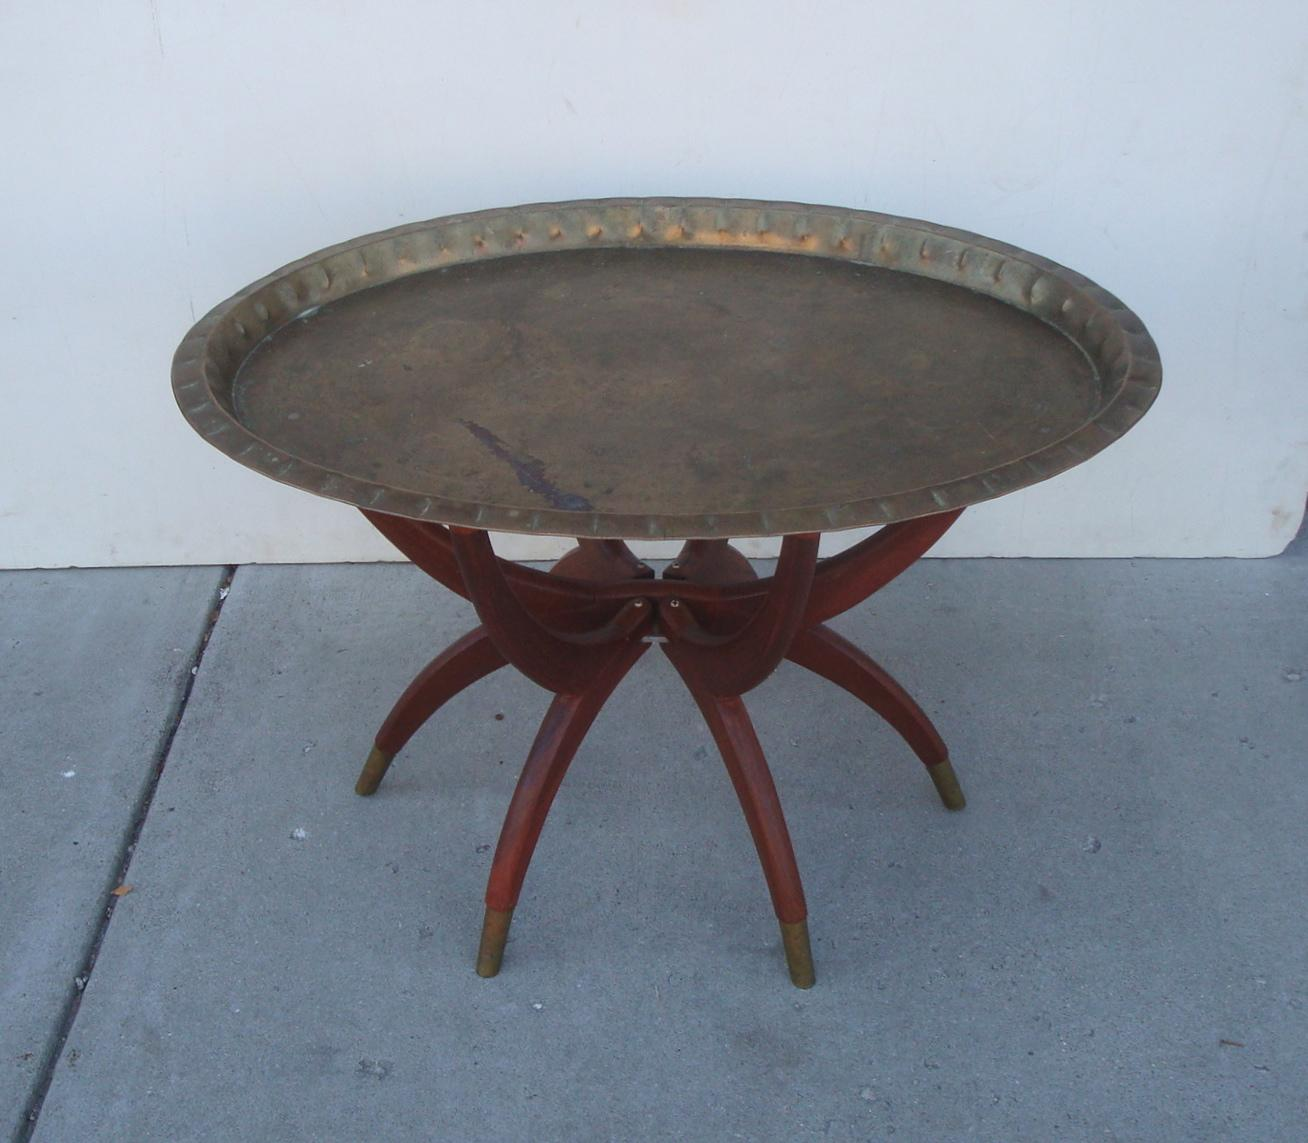 Oval Moroccan Teak U0026 Brass Spider Leg Tray Table   Image 2 ...